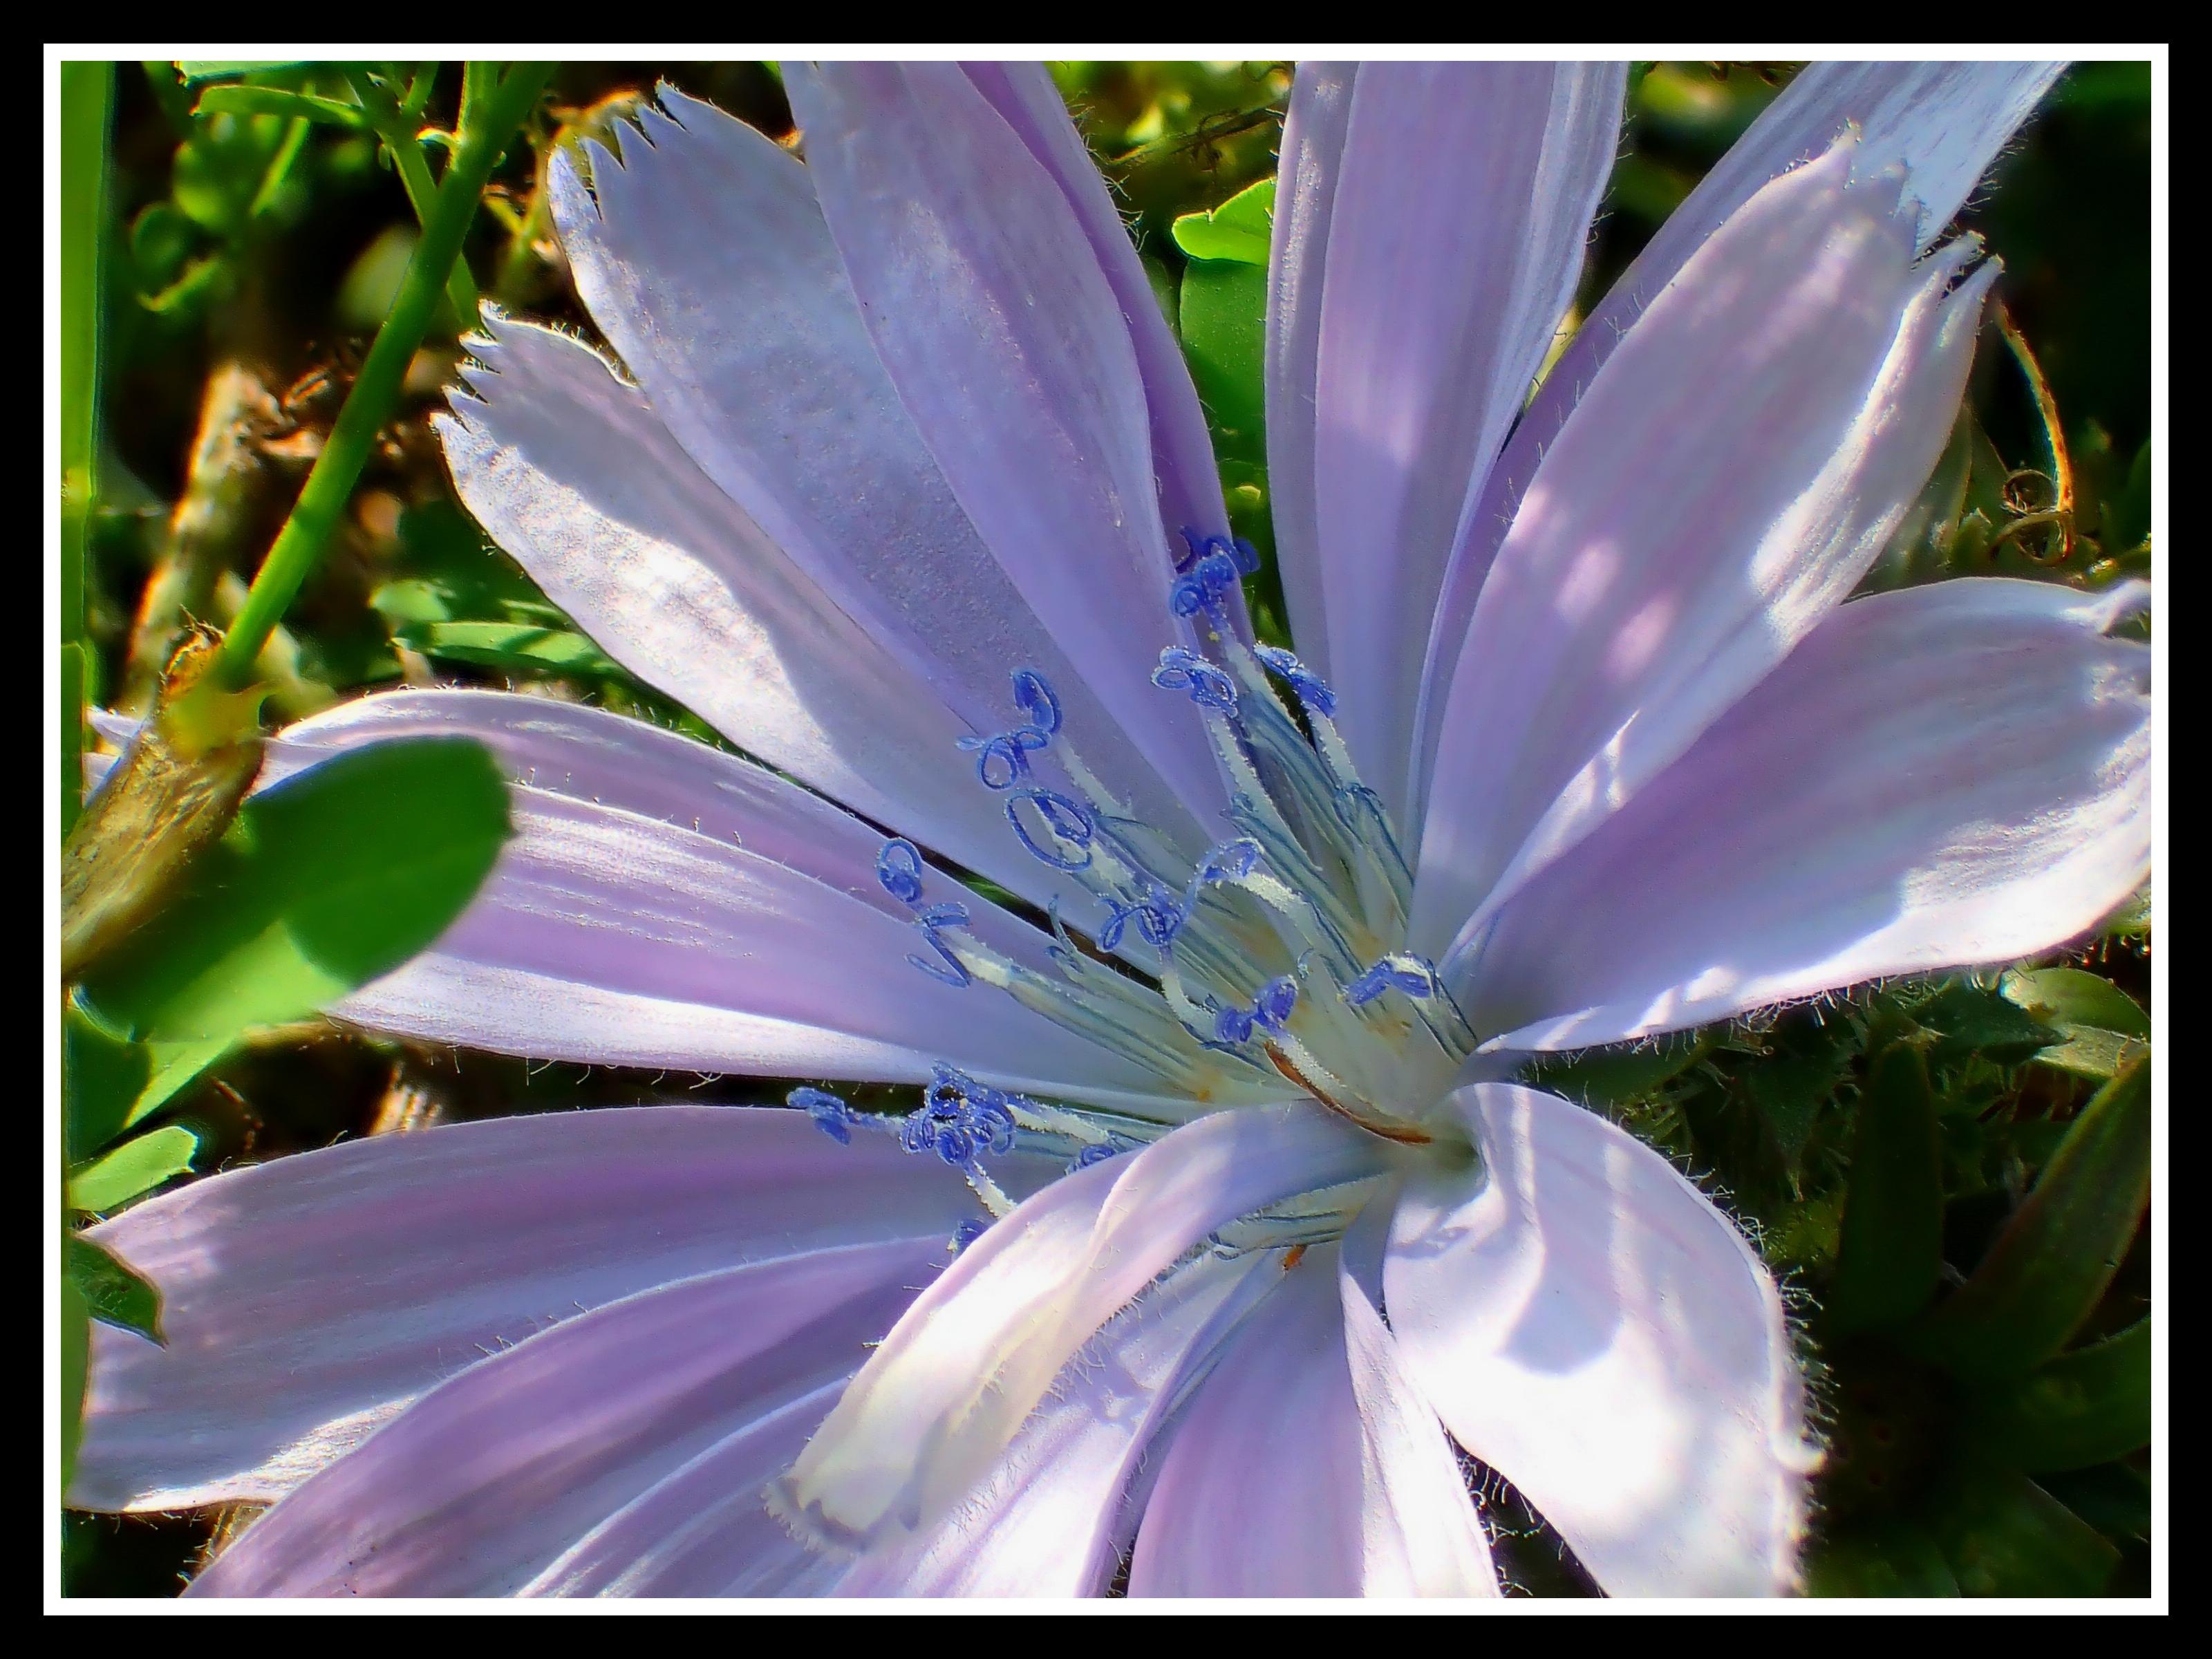 Wild Chicory. Photo by Thomas Peace c. 2015